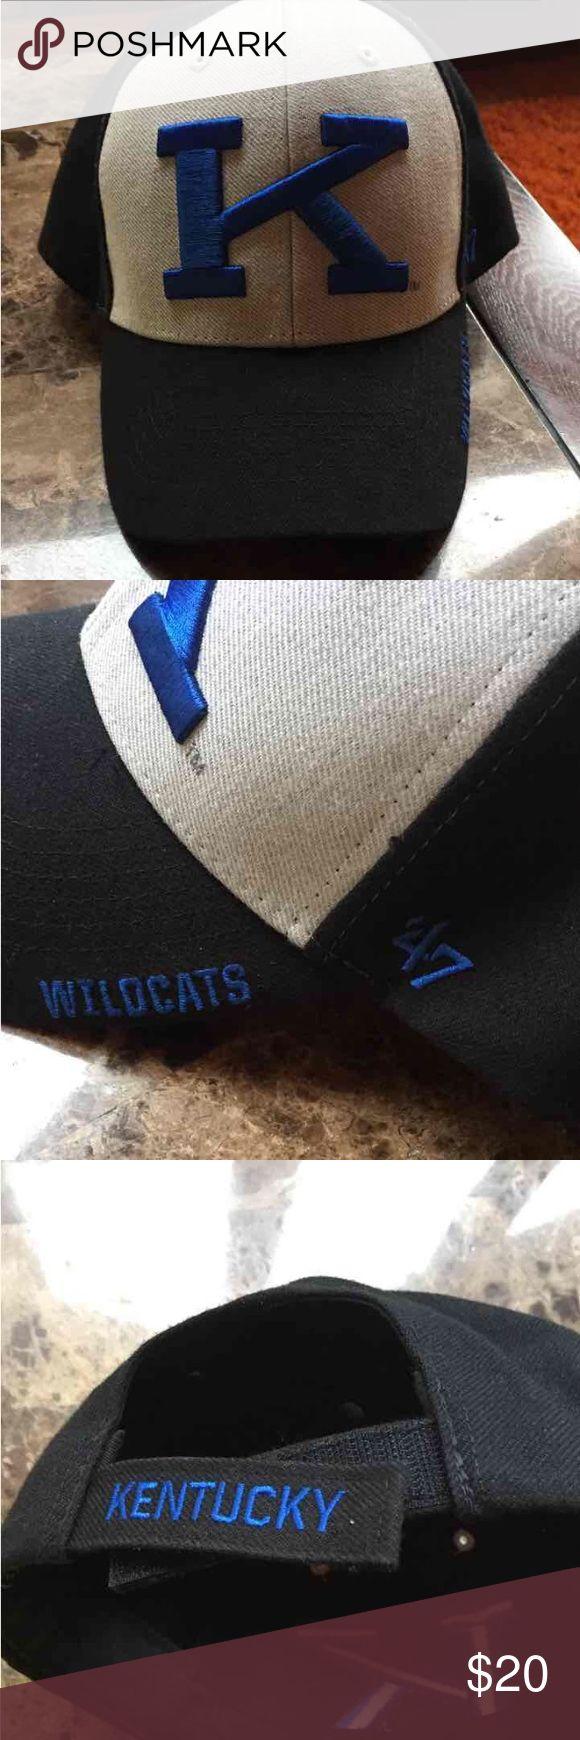 UK baseball cap Black grey blue K cap. Bought at Kentucky Wearhouse. Like new. Accessories Hats